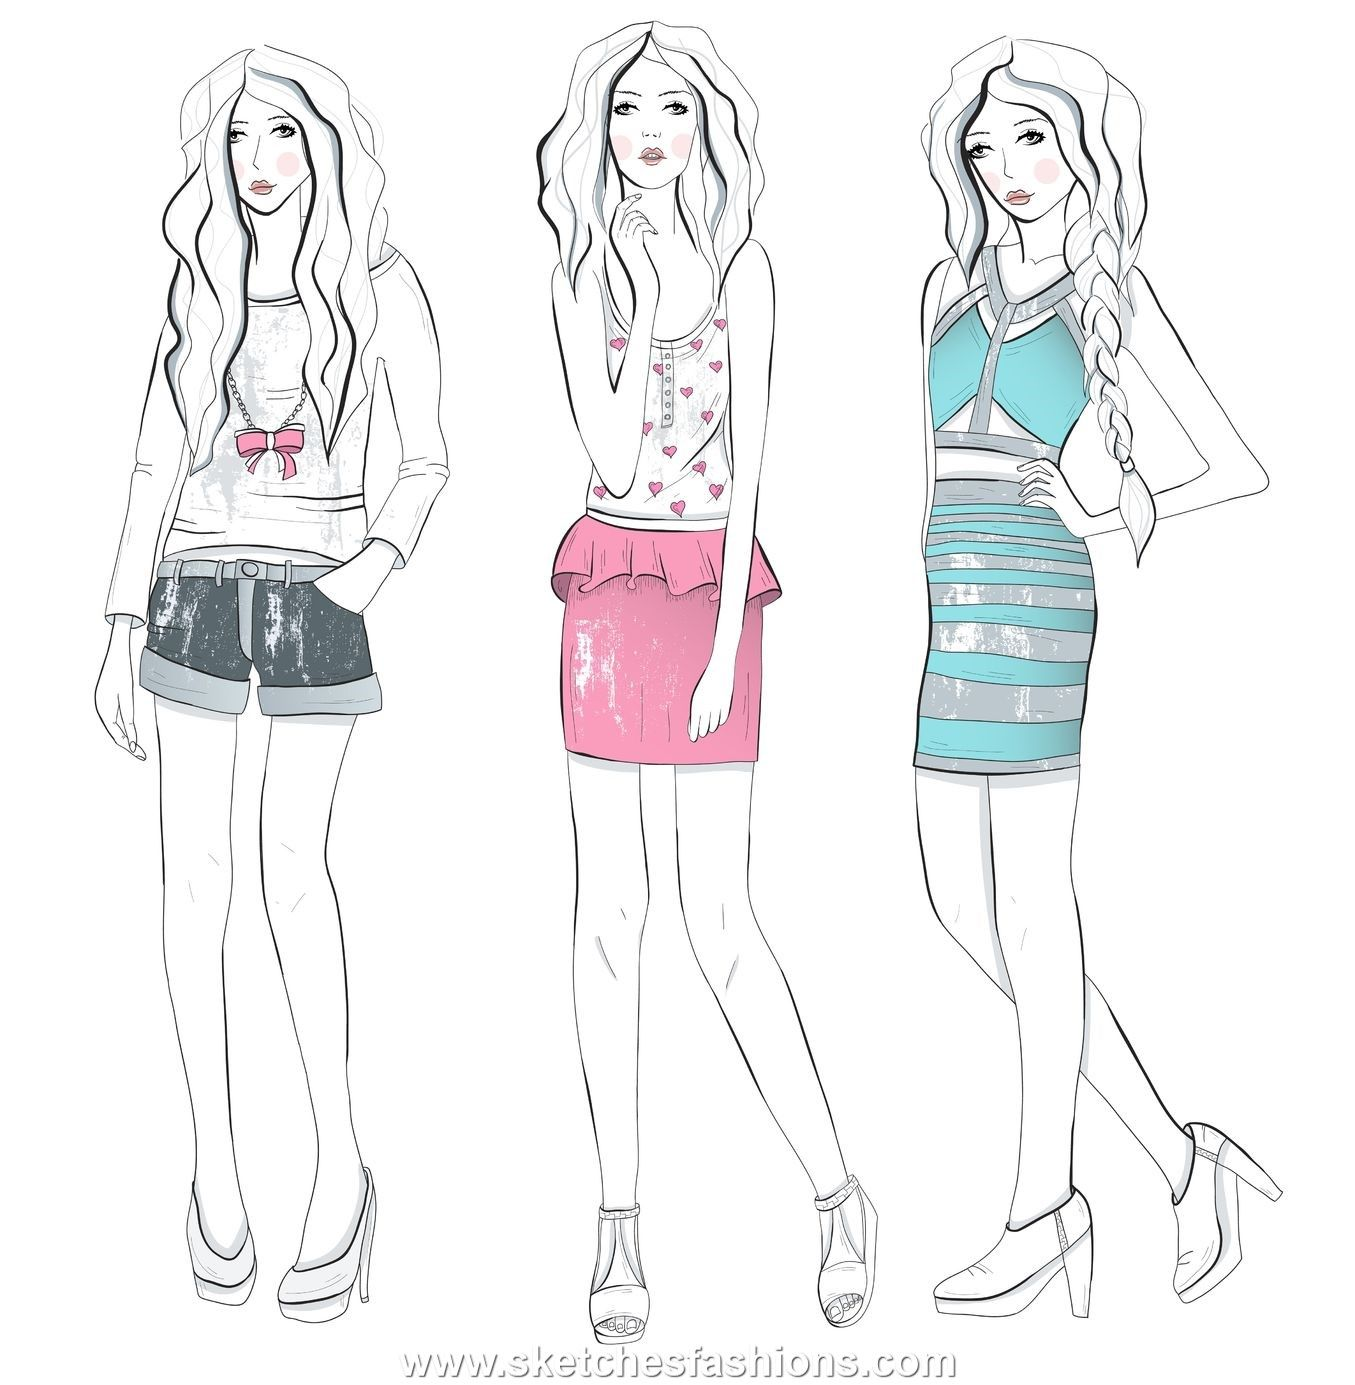 Pin Na Doske Fashion Illustration Class